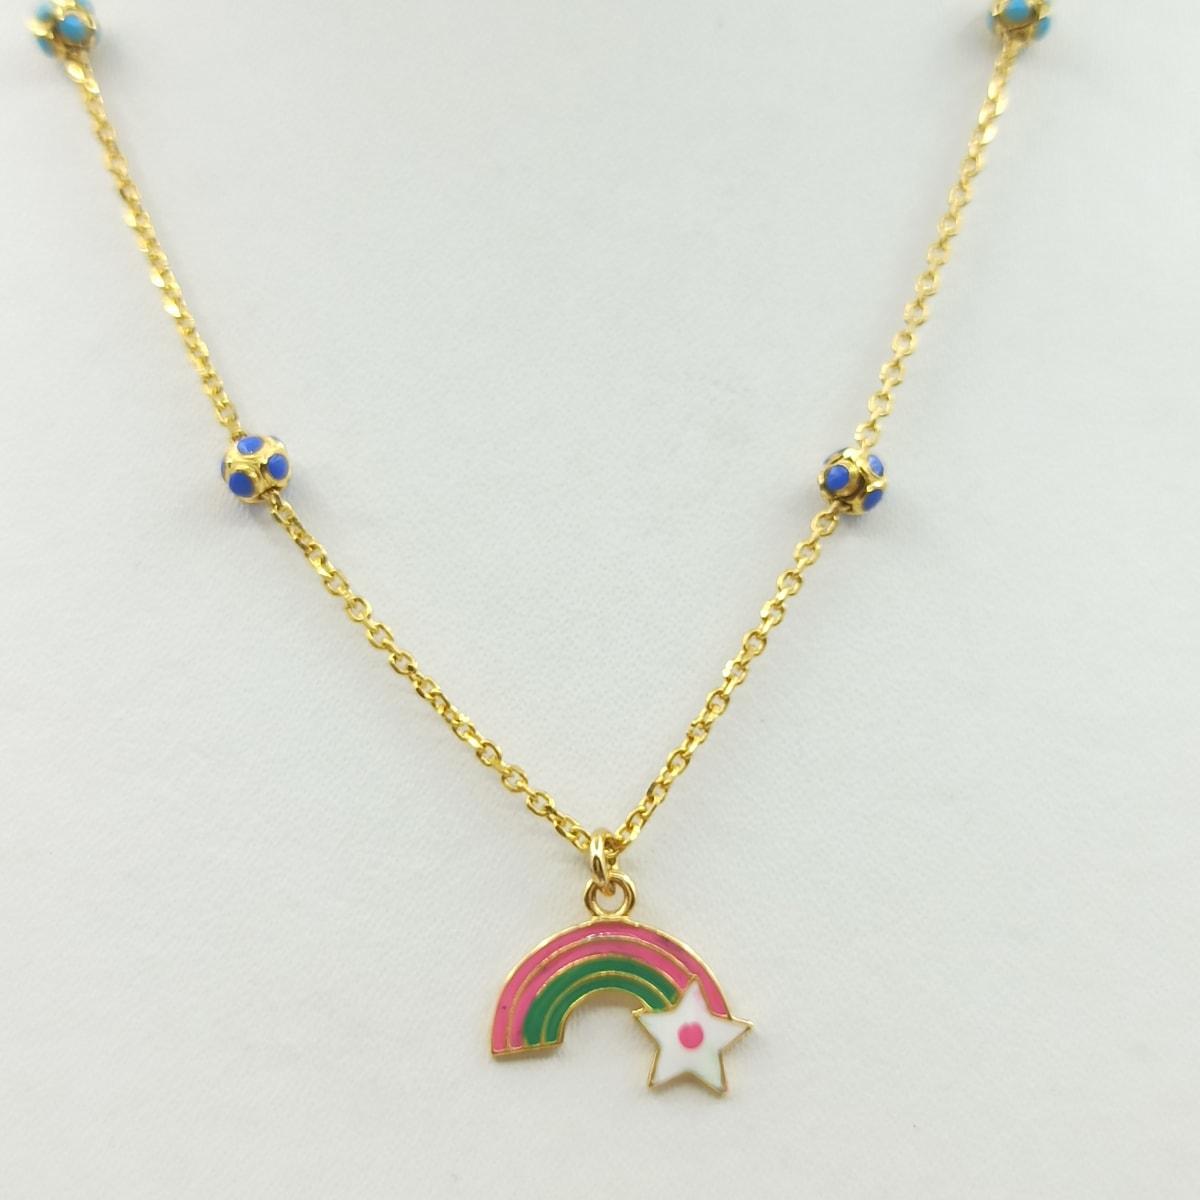 Rainbow Chain